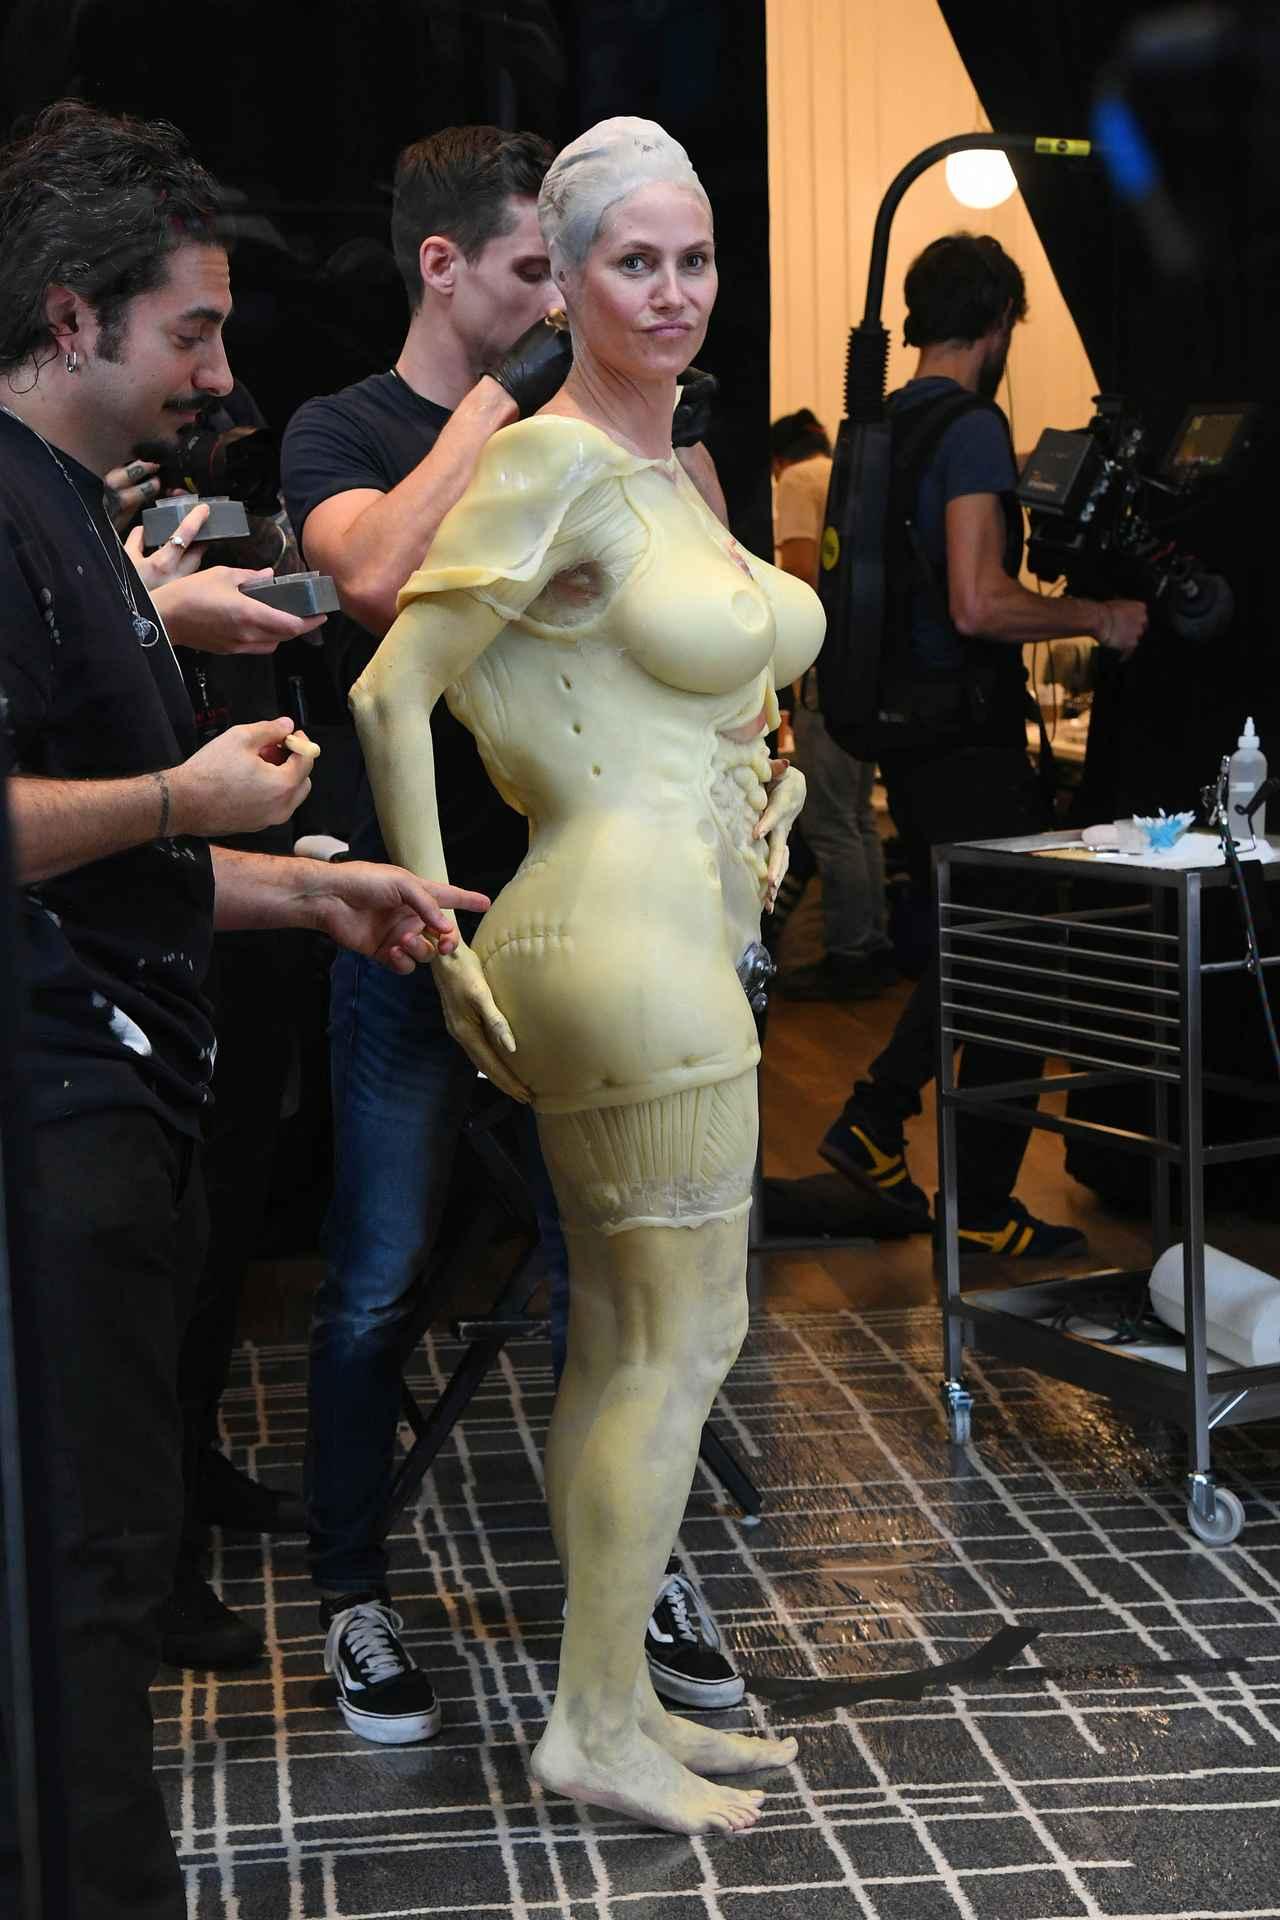 Images : 8番目の画像 - 「ハロウィンの女王」ハイディ・クルムの仮装が怖すぎる - フロントロウ -海外セレブ情報を発信